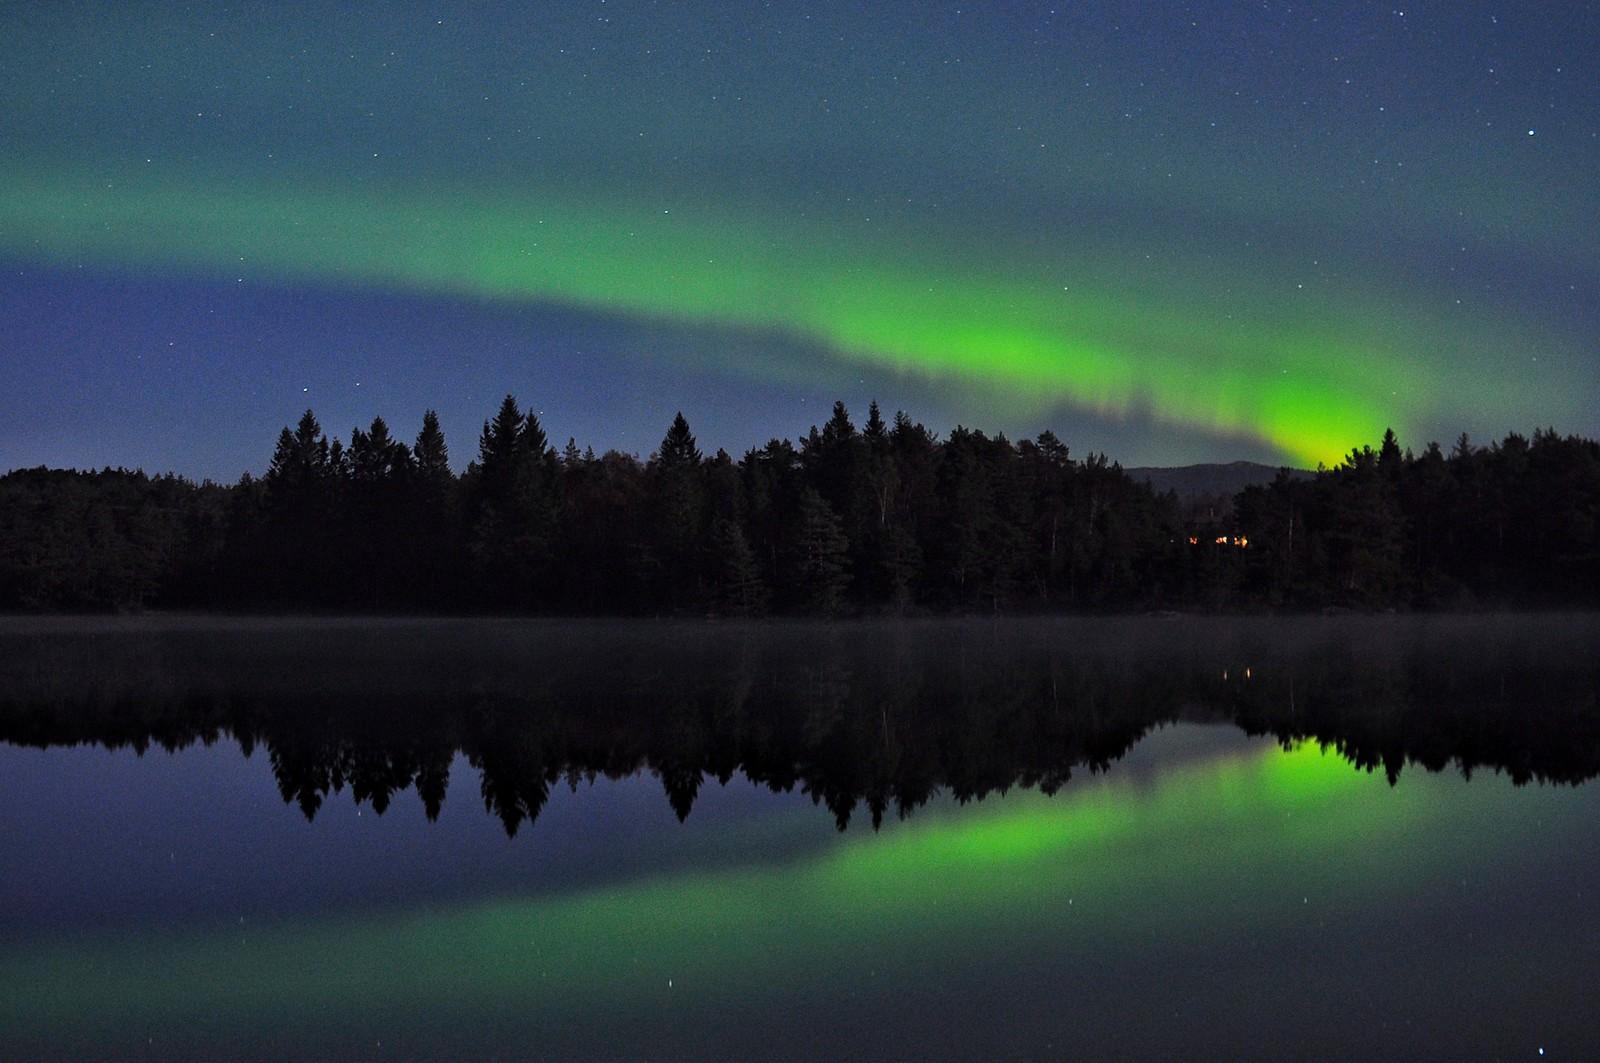 På Vågseidet i Lindås var det vakkert i natt. – Dette var mitt første nordlys-foto i år, skriv Mildrid Wergeland Hegle på Instagram.